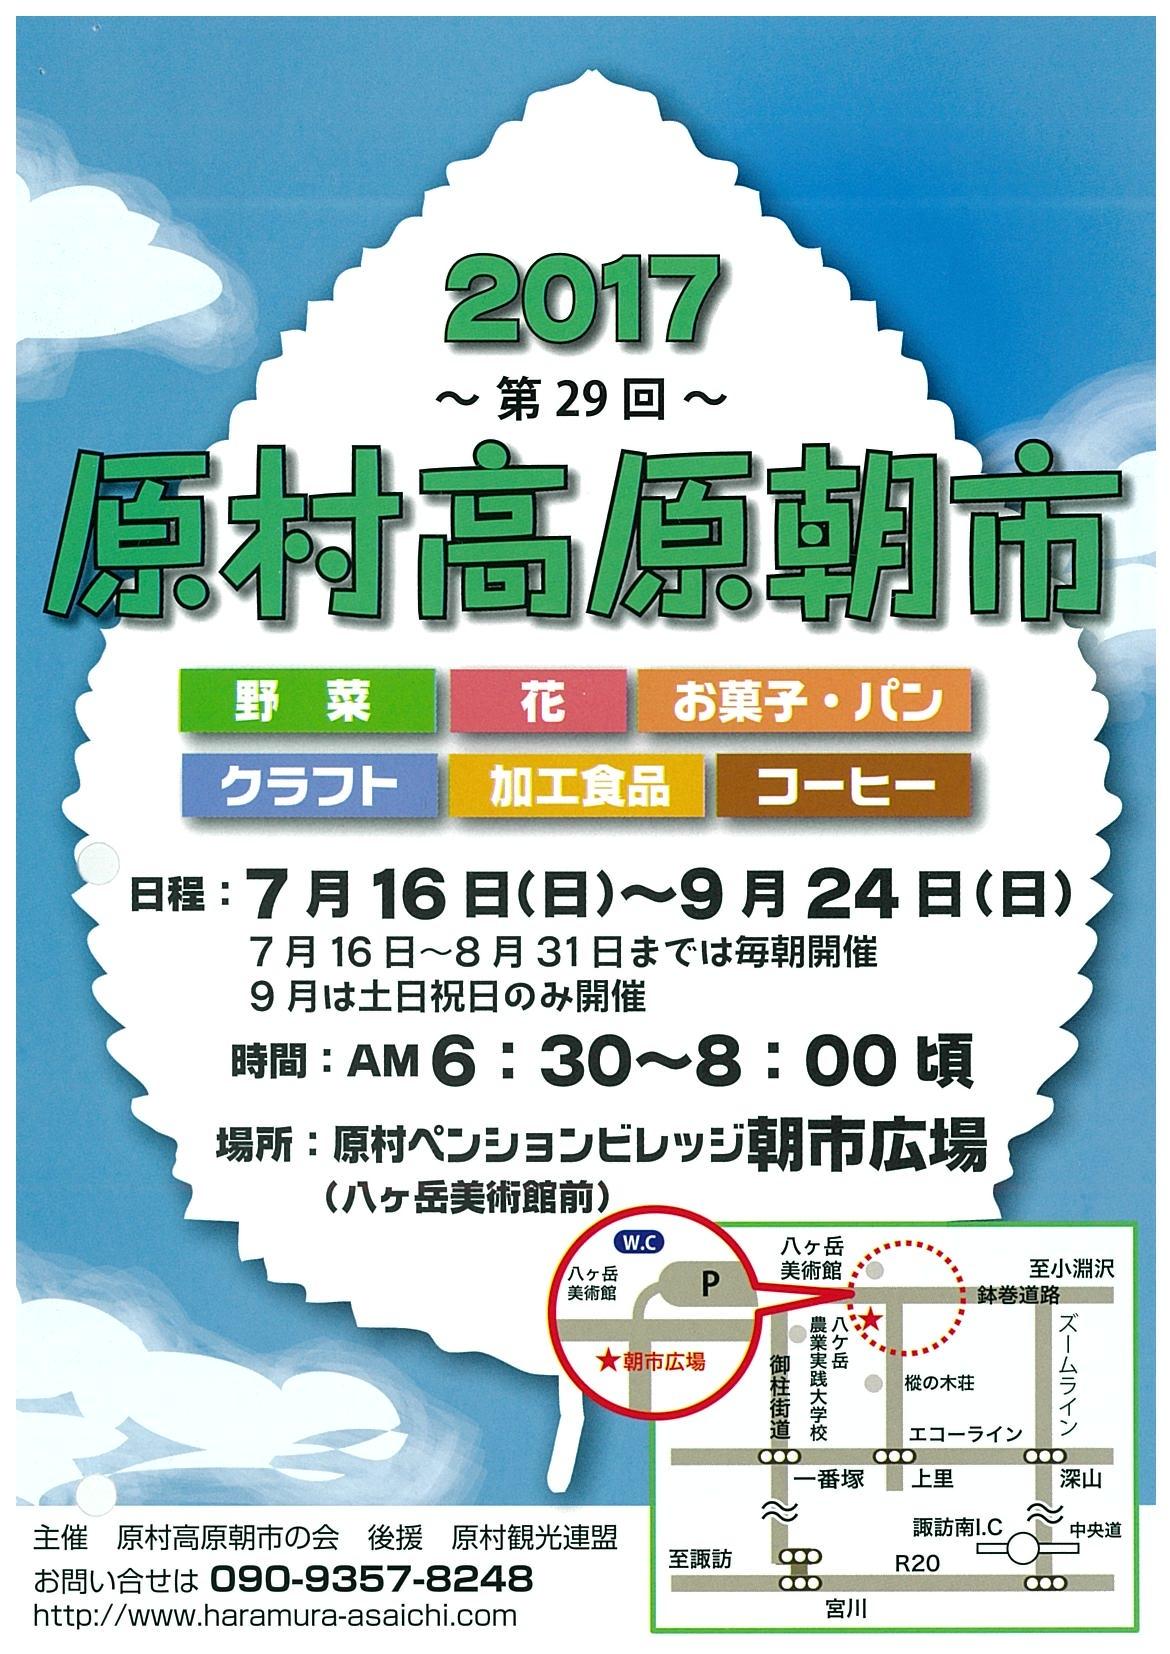 http://www.alpico.co.jp/shikinomori/news/images/fe3d07c74d98e215b49041755407cf92eba841f6.jpg